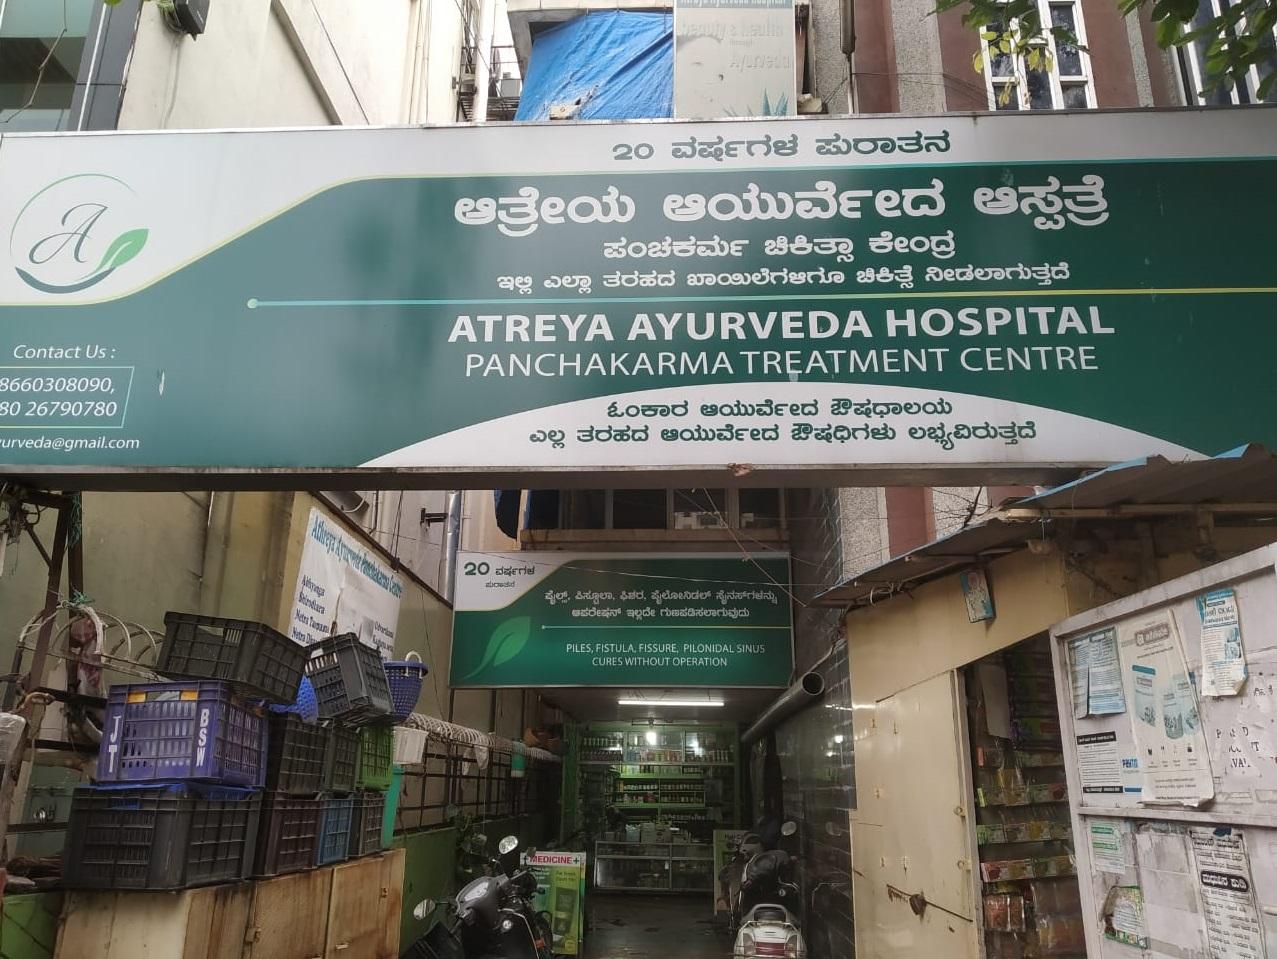 Atreya Ayurveda Hospital - Padmanabhanagar - Bangalore Image